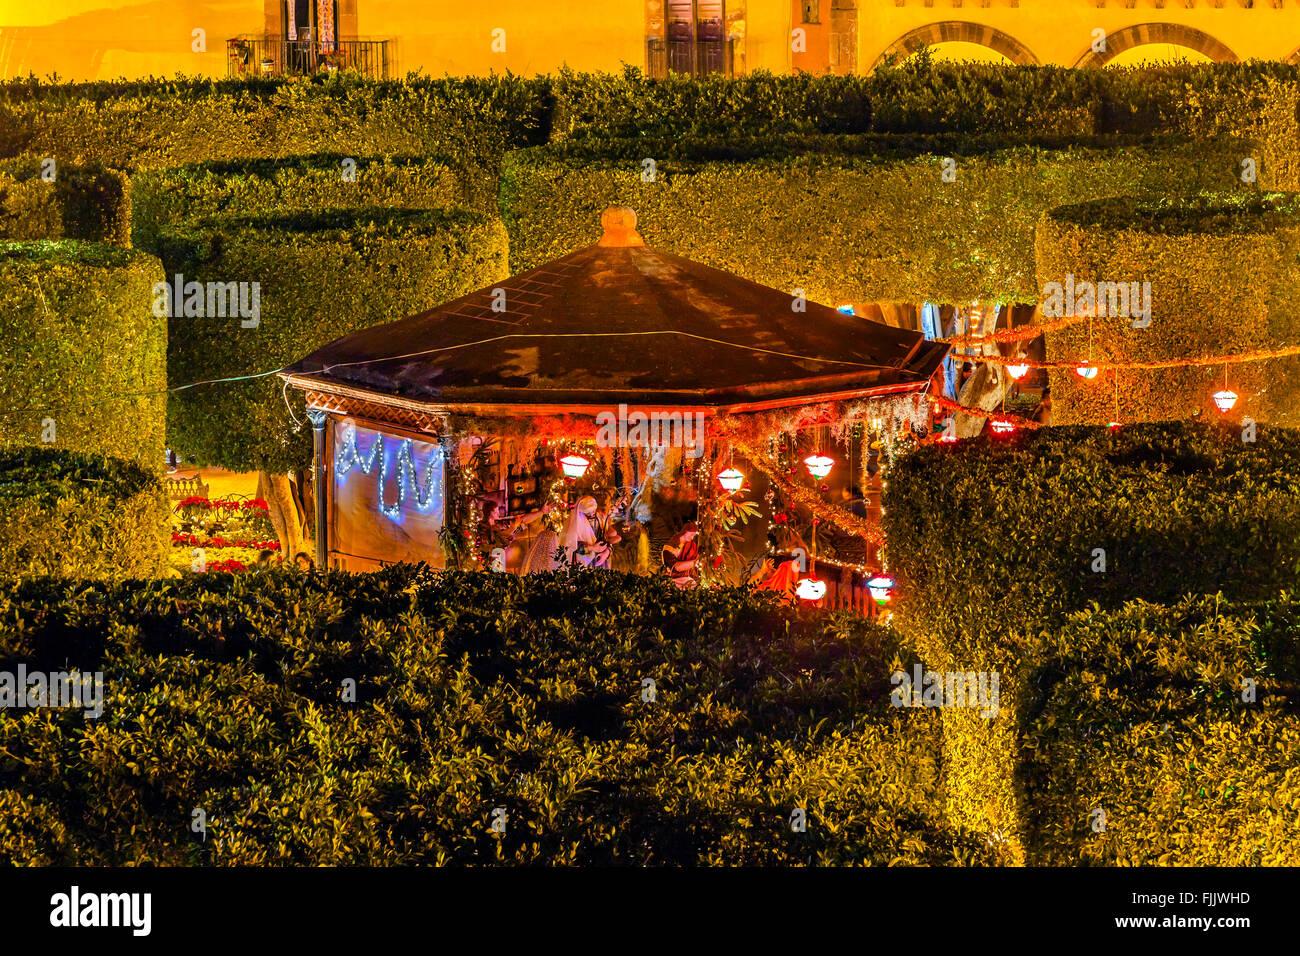 Jardin Town Tree Square San Miguel de Allende Mexico. - Stock Image